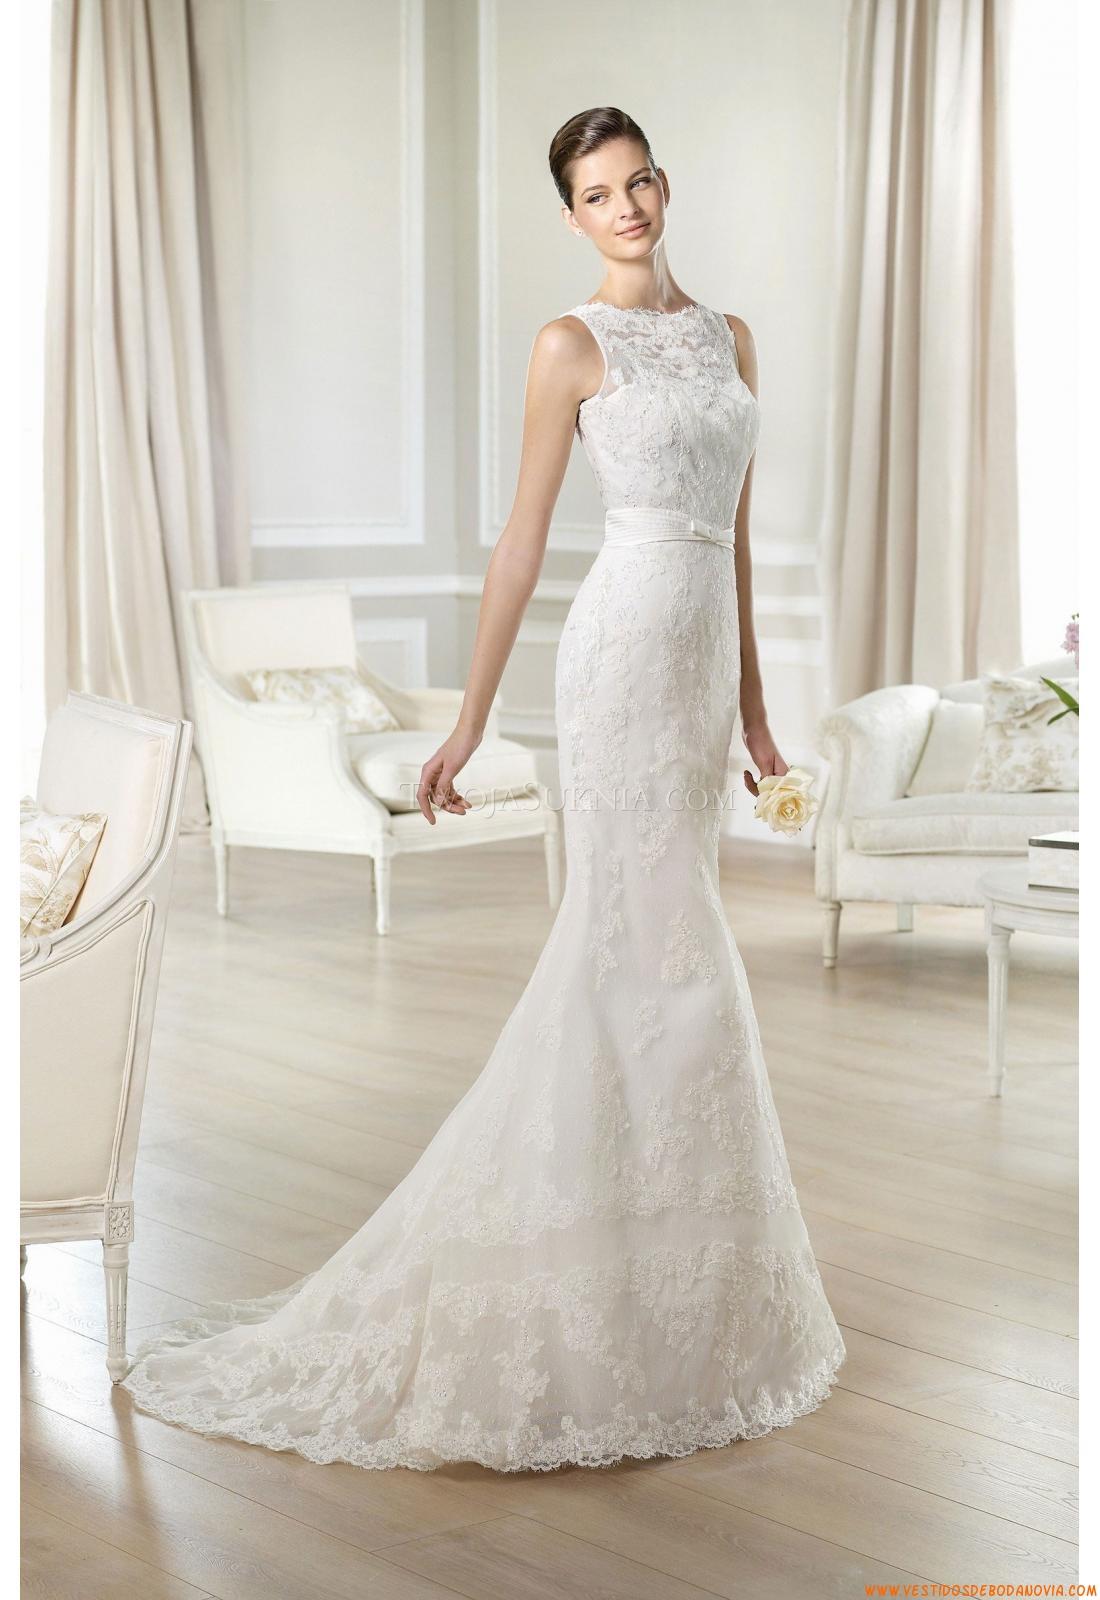 Vestidos de moda para matrimonio 2016